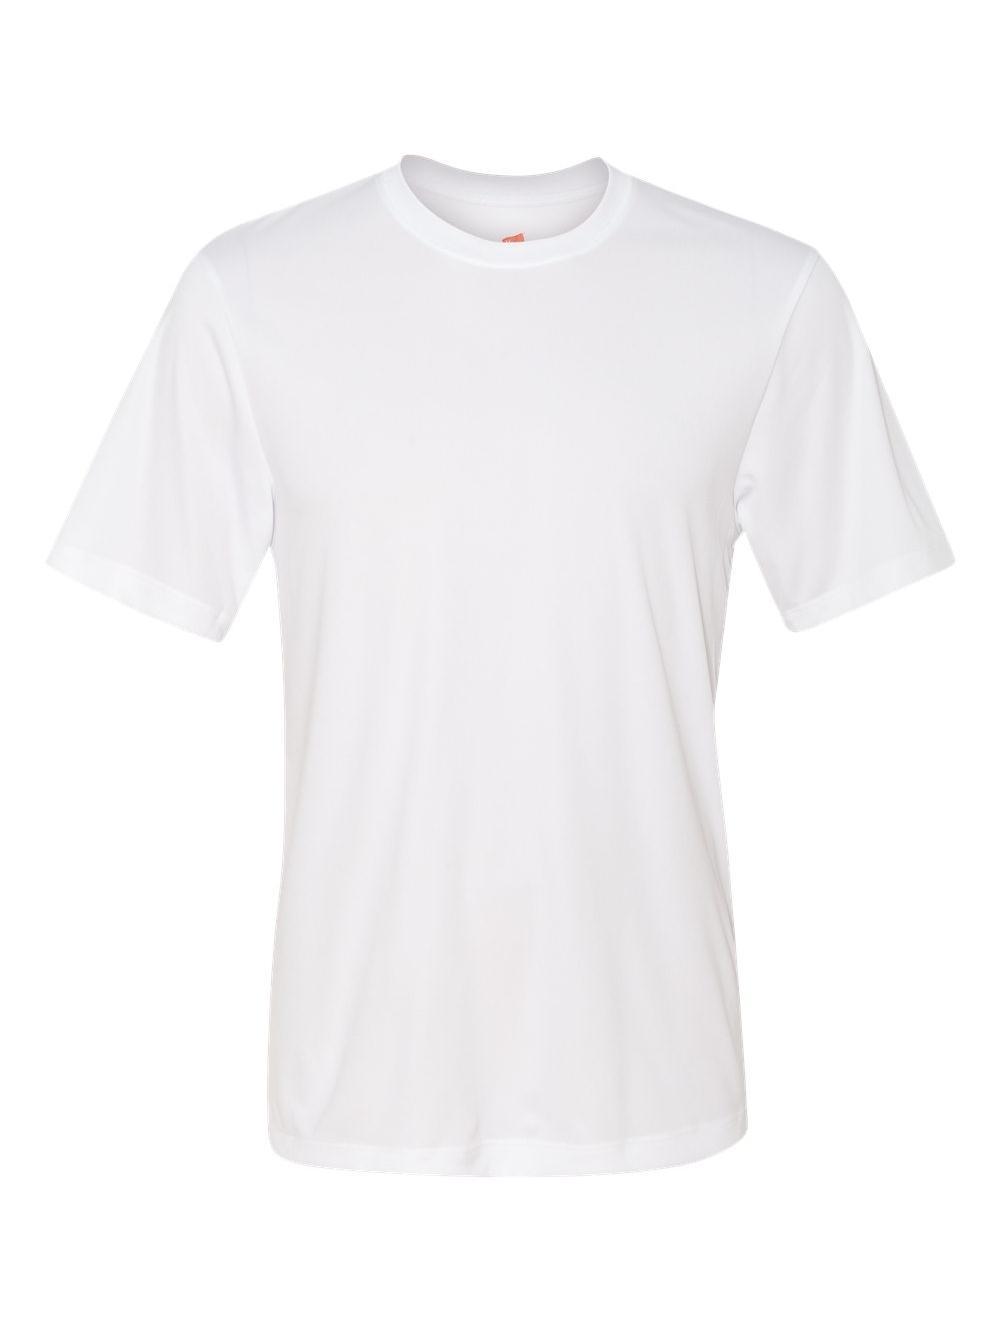 Hanes T-Shirts Cool Dri Performance Short Sleeve T-Shirt